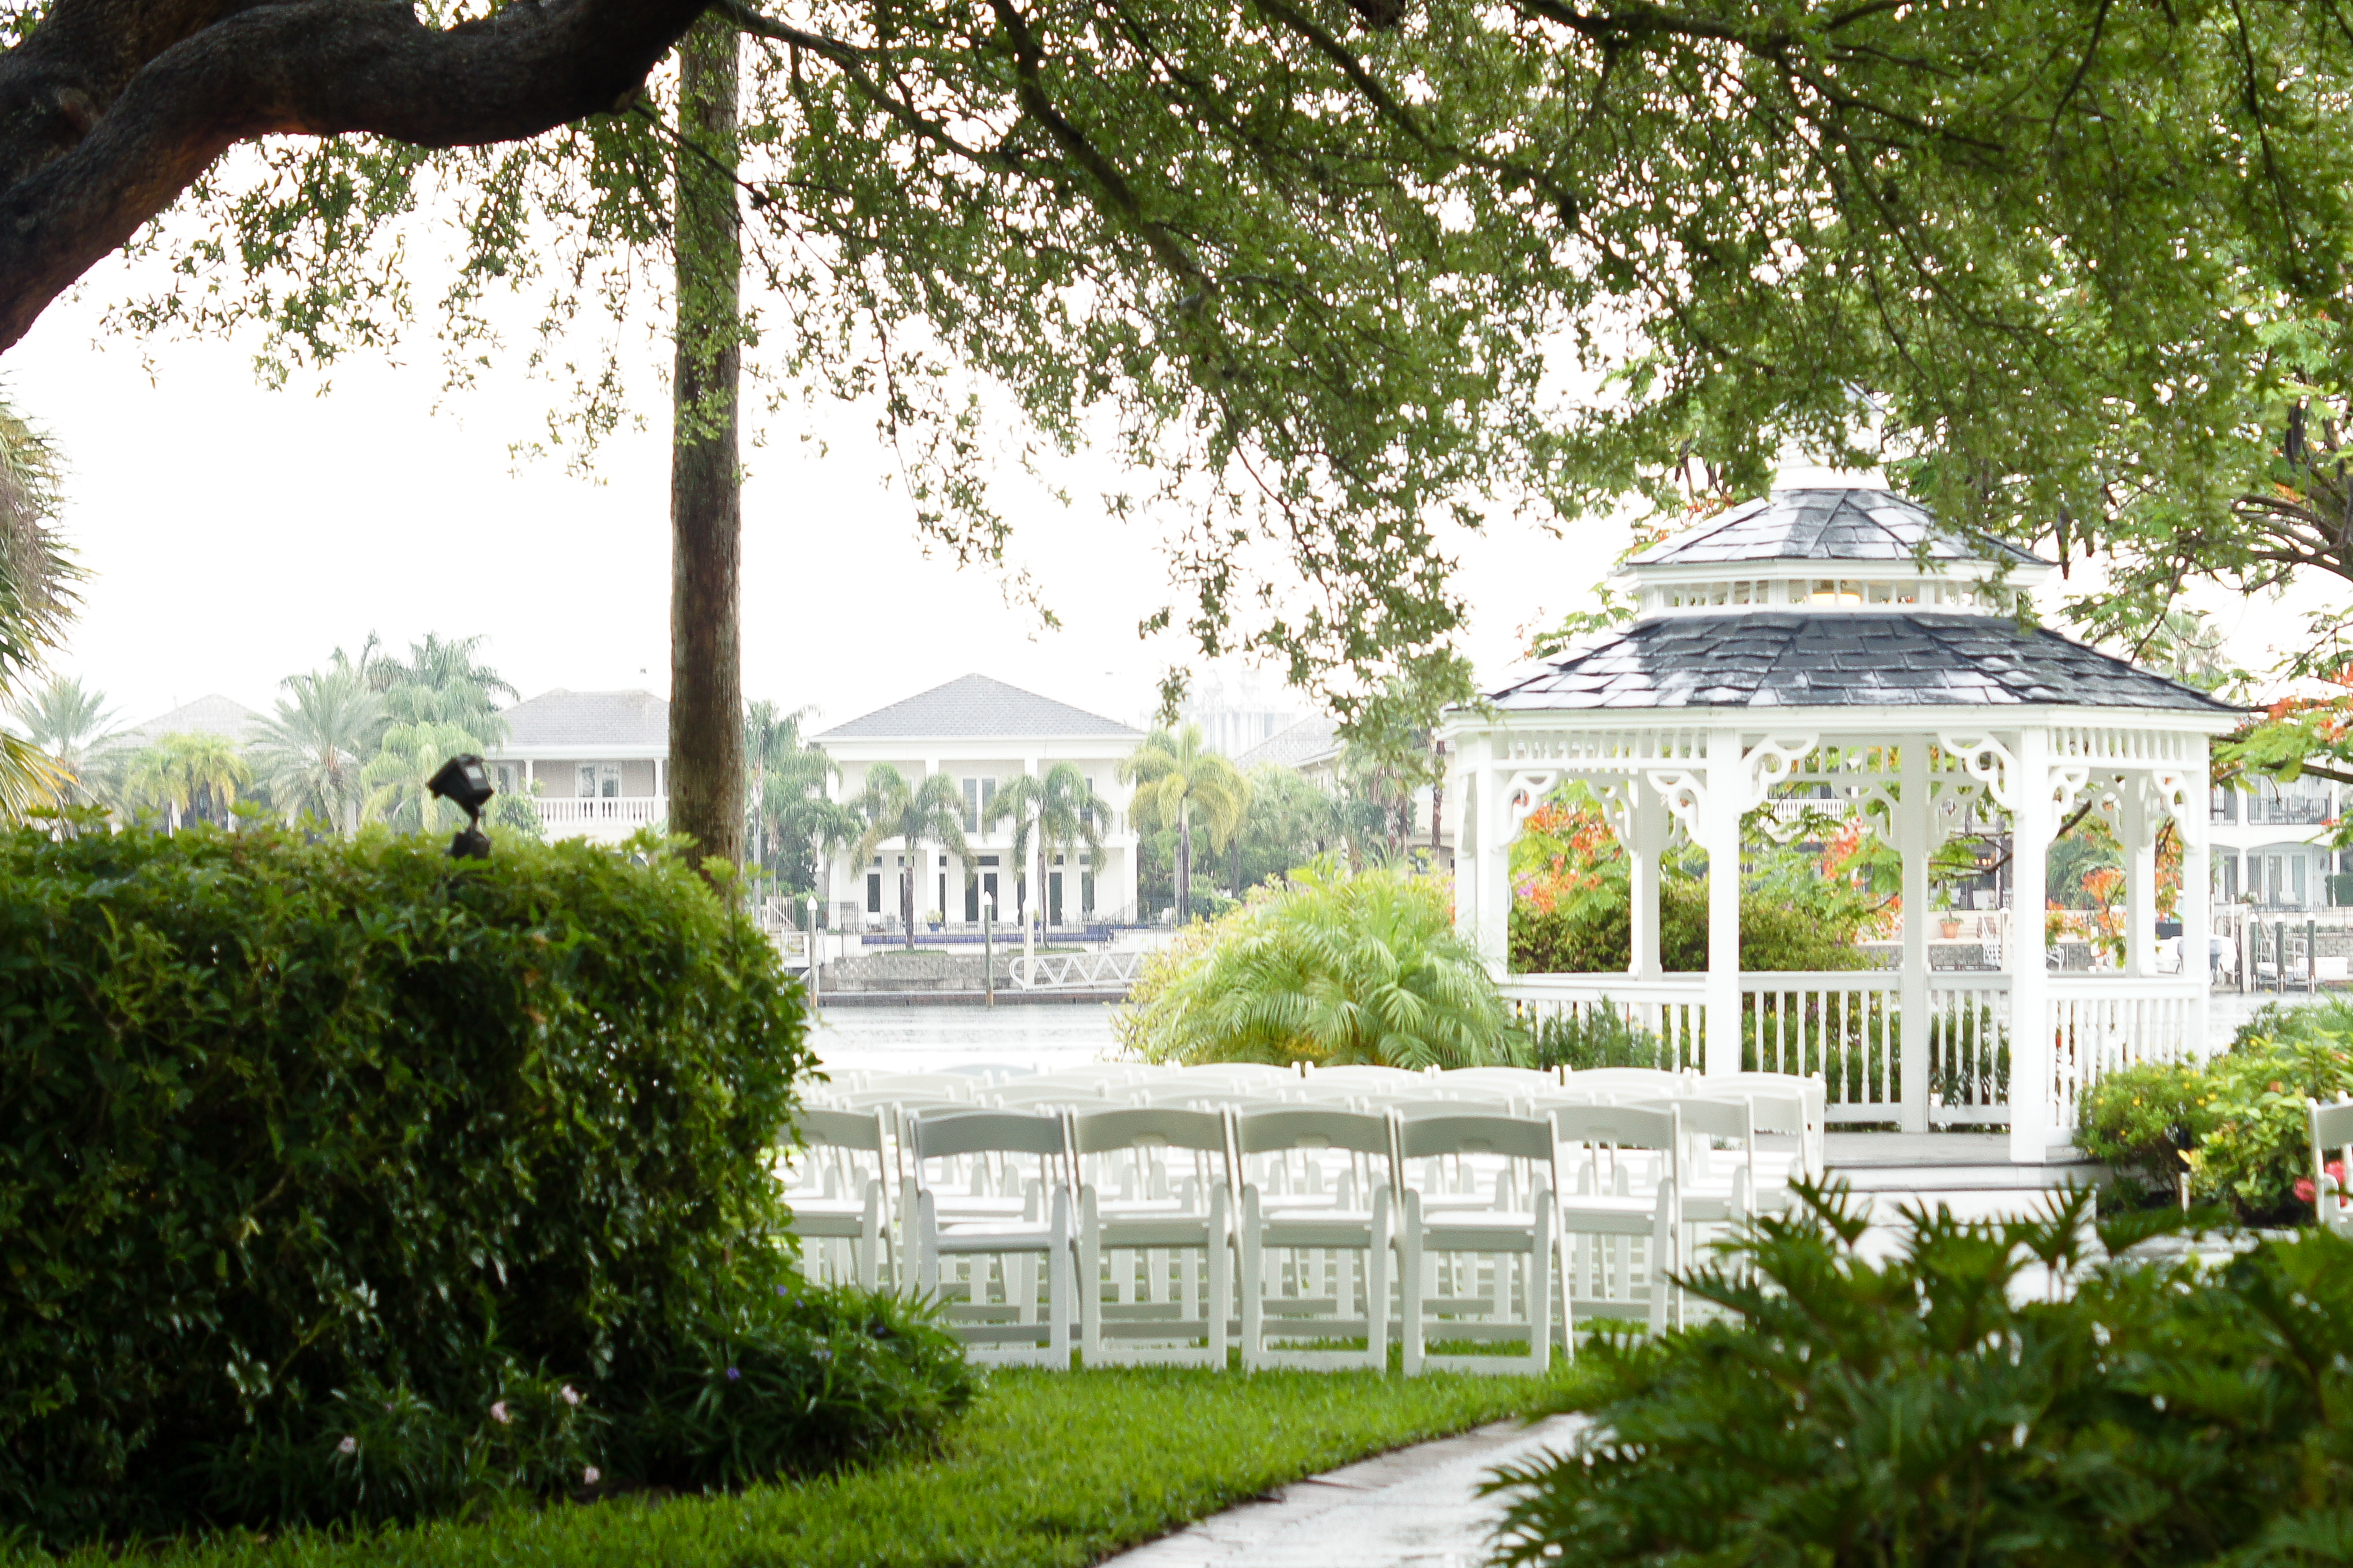 Davis island garden club tampa bridal show september 20 for Small outdoor wedding venues